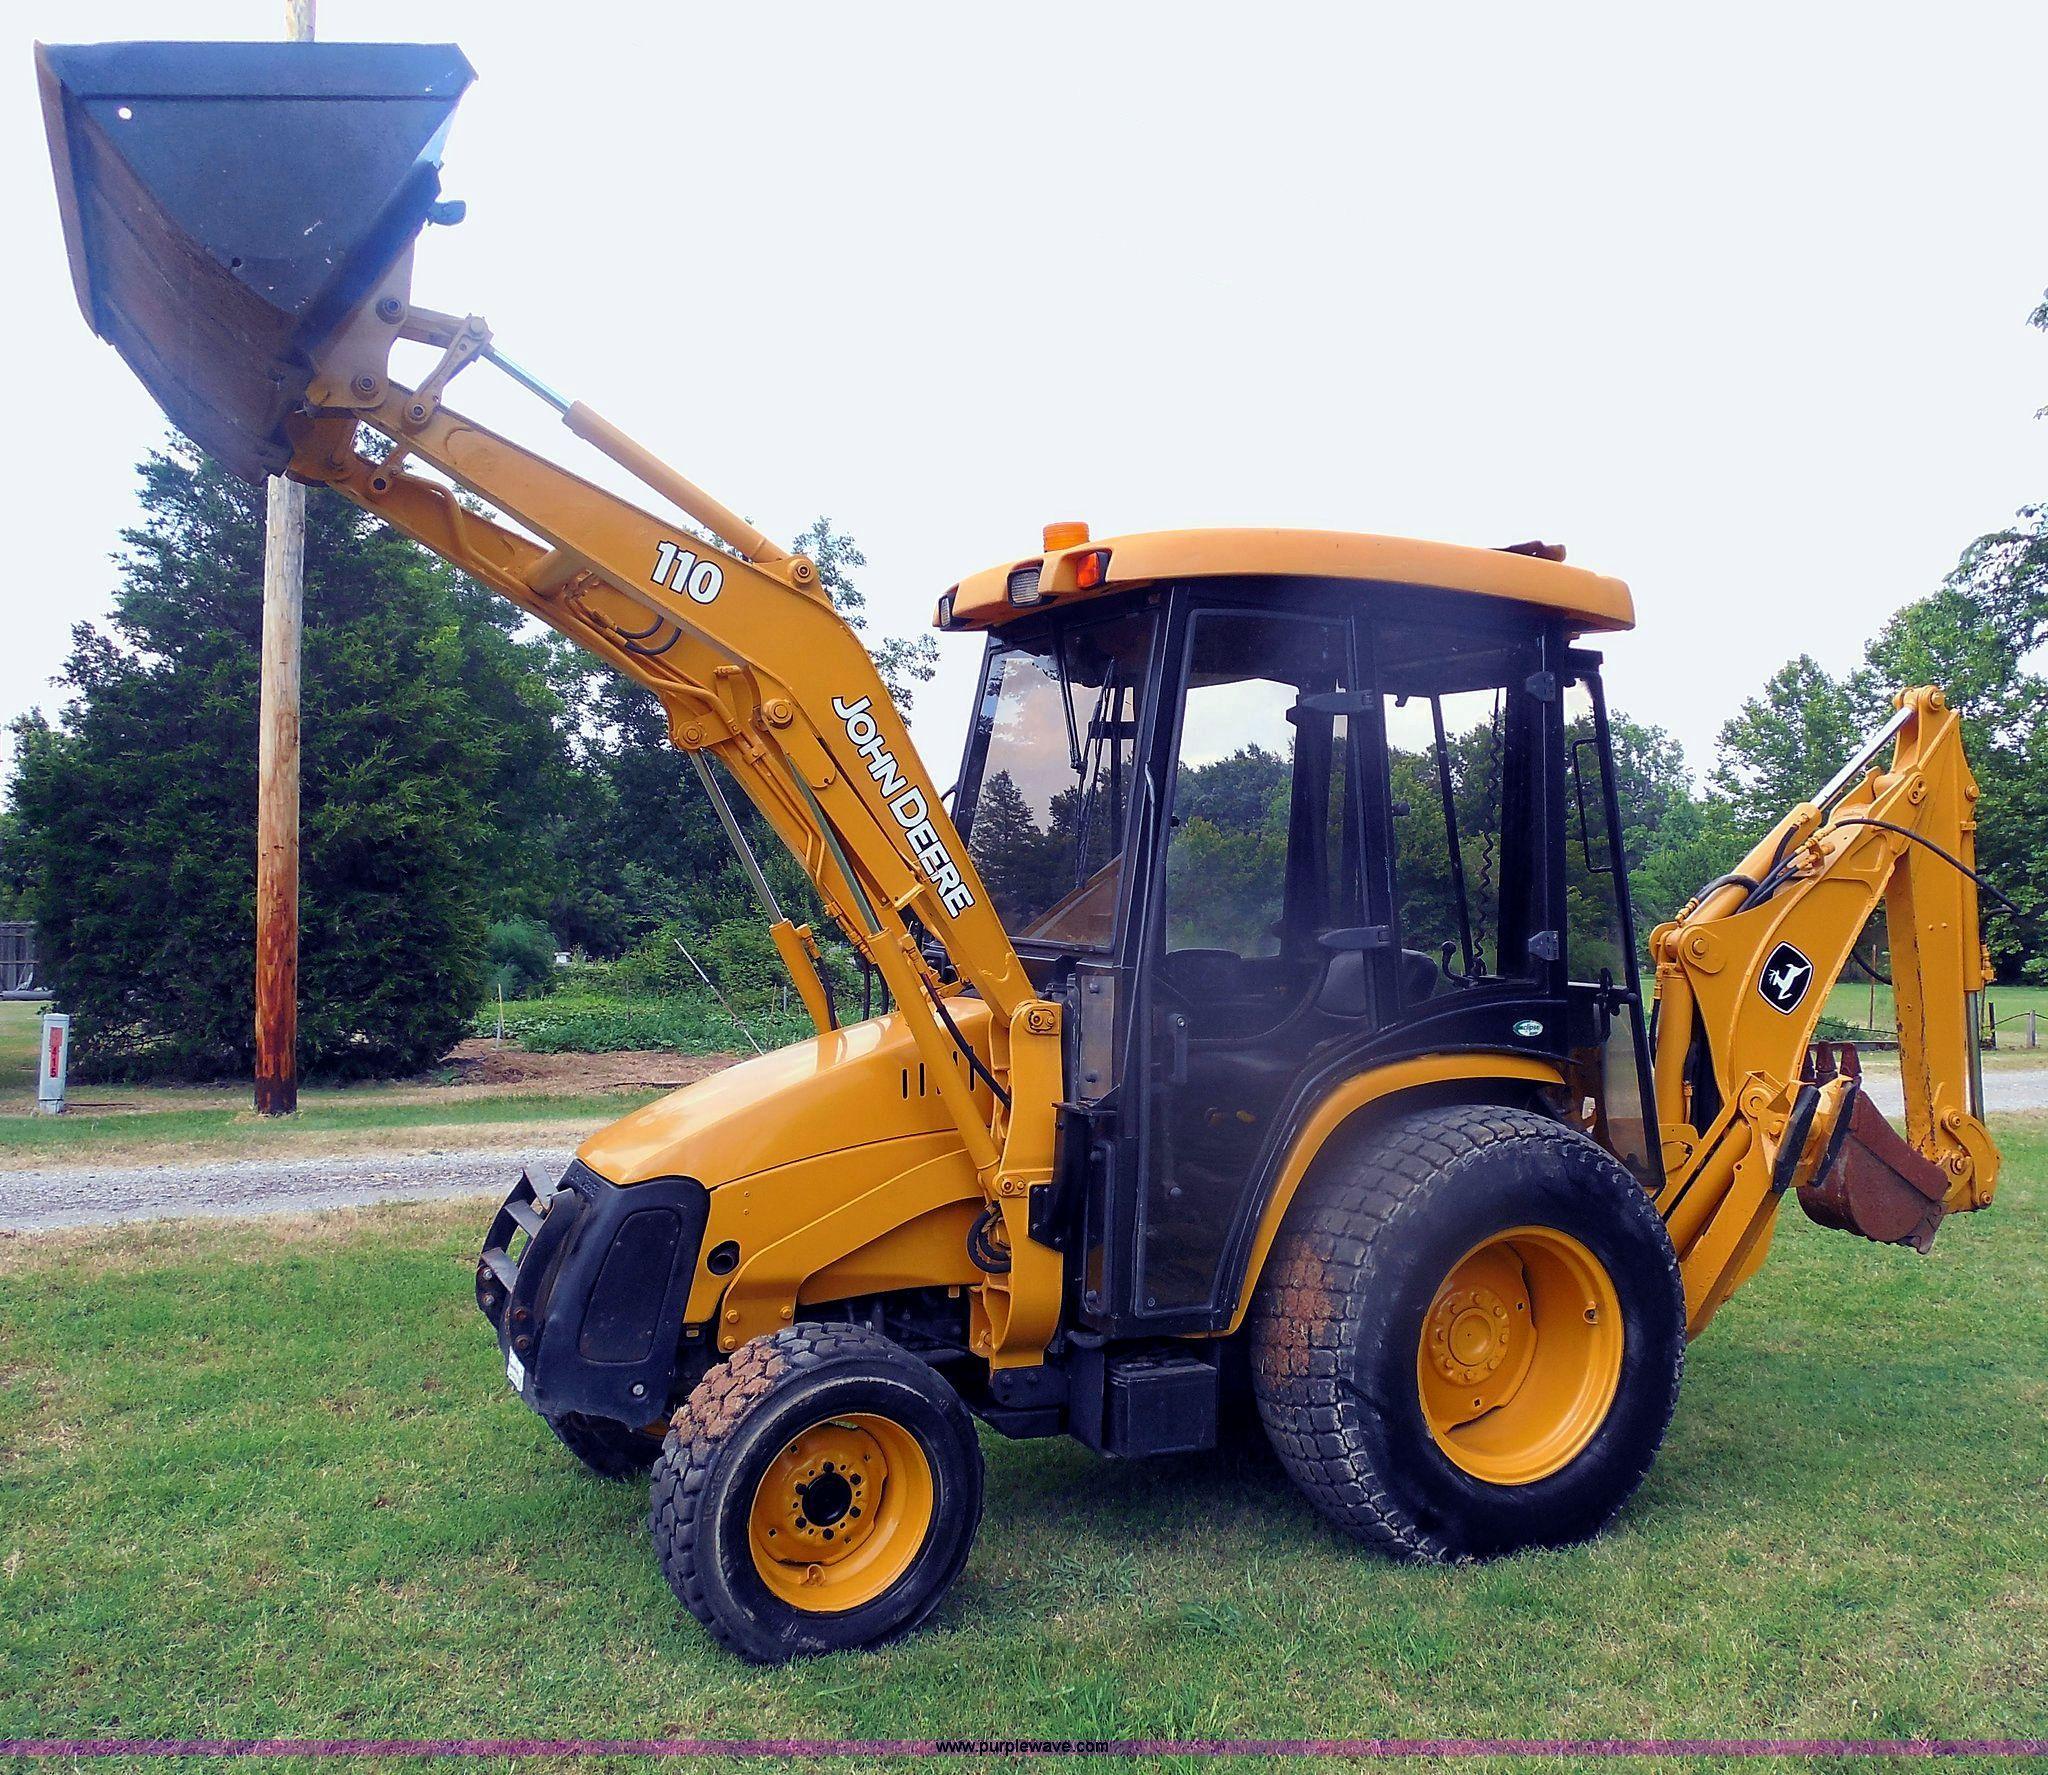 john deere 110 tractor loader backhoe (worldwide edition) parts catalog -  pc2914   a++ repair manual store  a++ repair manual store